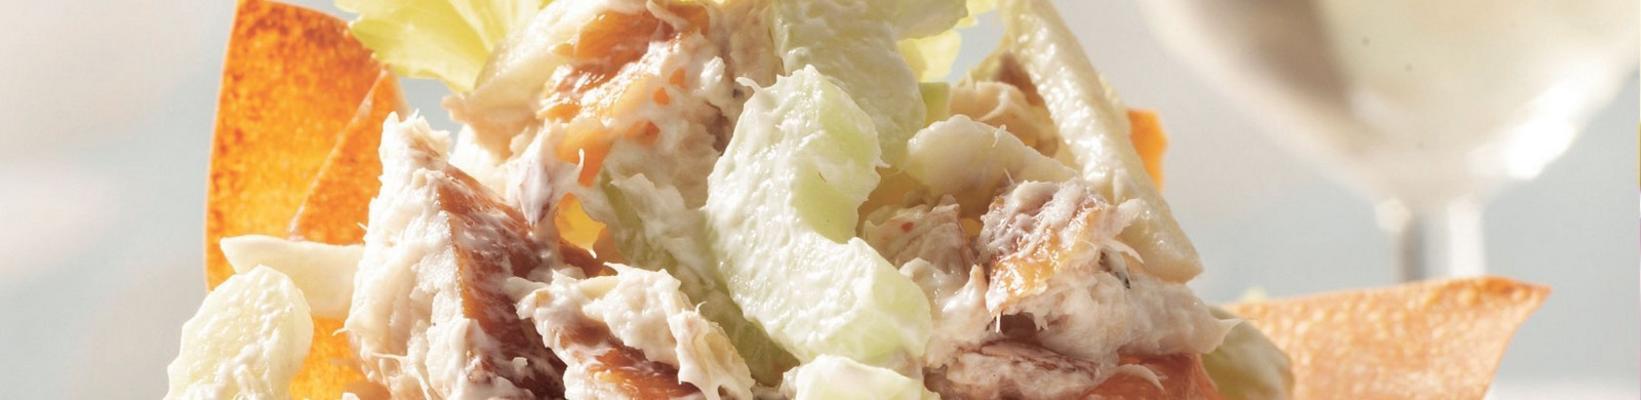 filo tarts with smoked mackerel salad